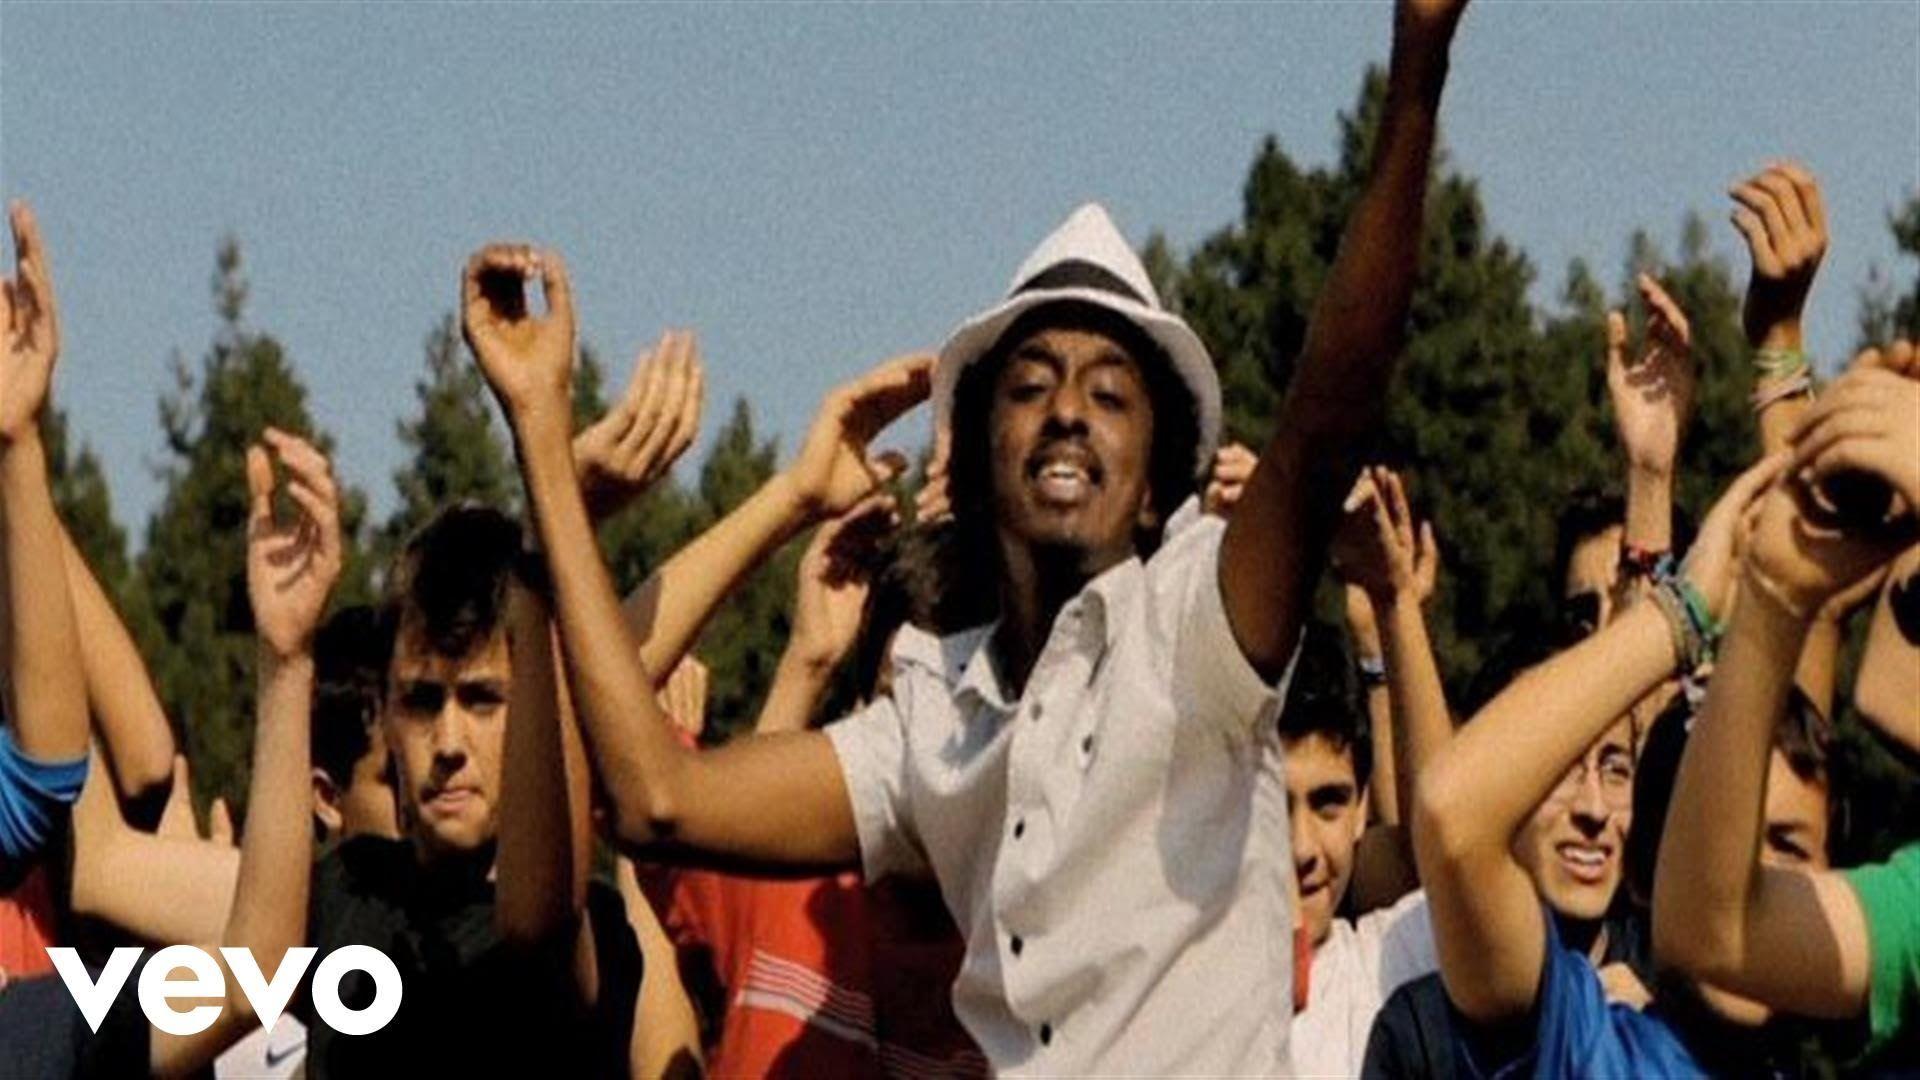 K'NAAN - Wavin' Flag (Coca-Cola Celebration Mix) #Music